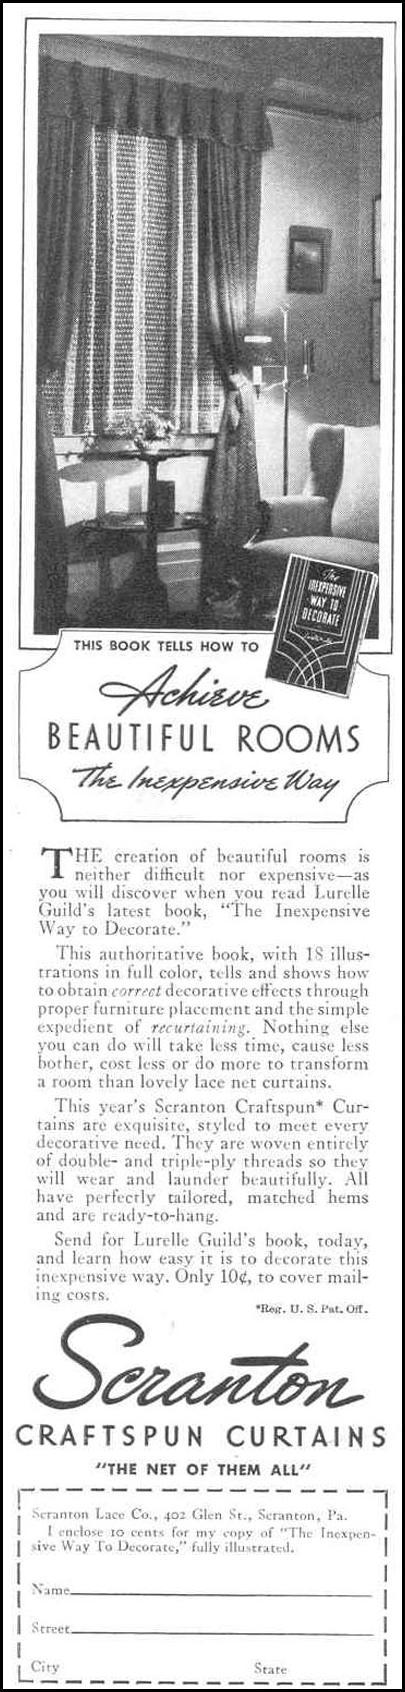 SCRANTON CRAFTSPUN CURTAINS GOOD HOUSEKEEPING 03/01/1940 p. 182